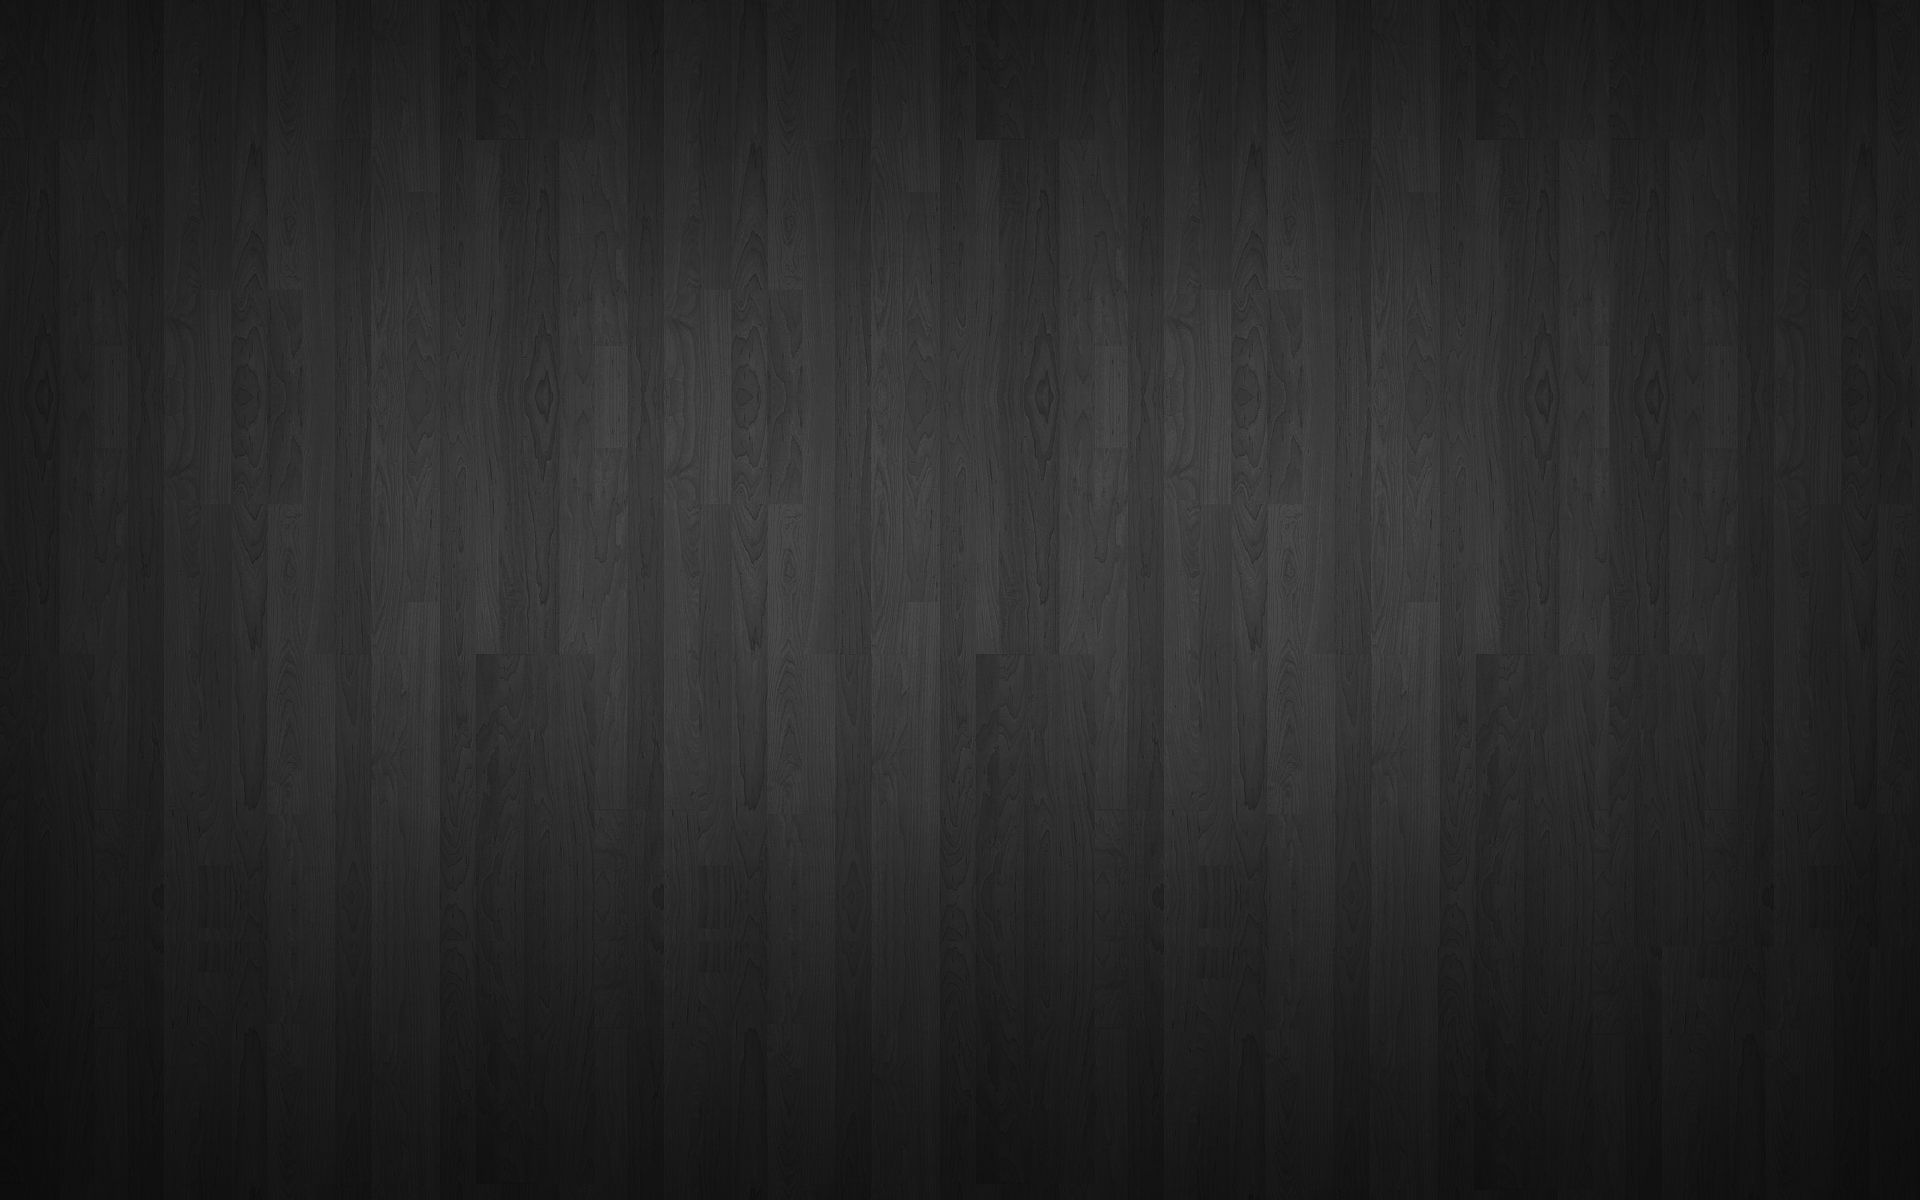 Amazing Gray Wood Tile Floors | Inspiration Tiles. Dark Wood Floor Pictures For  Flooring Decor .